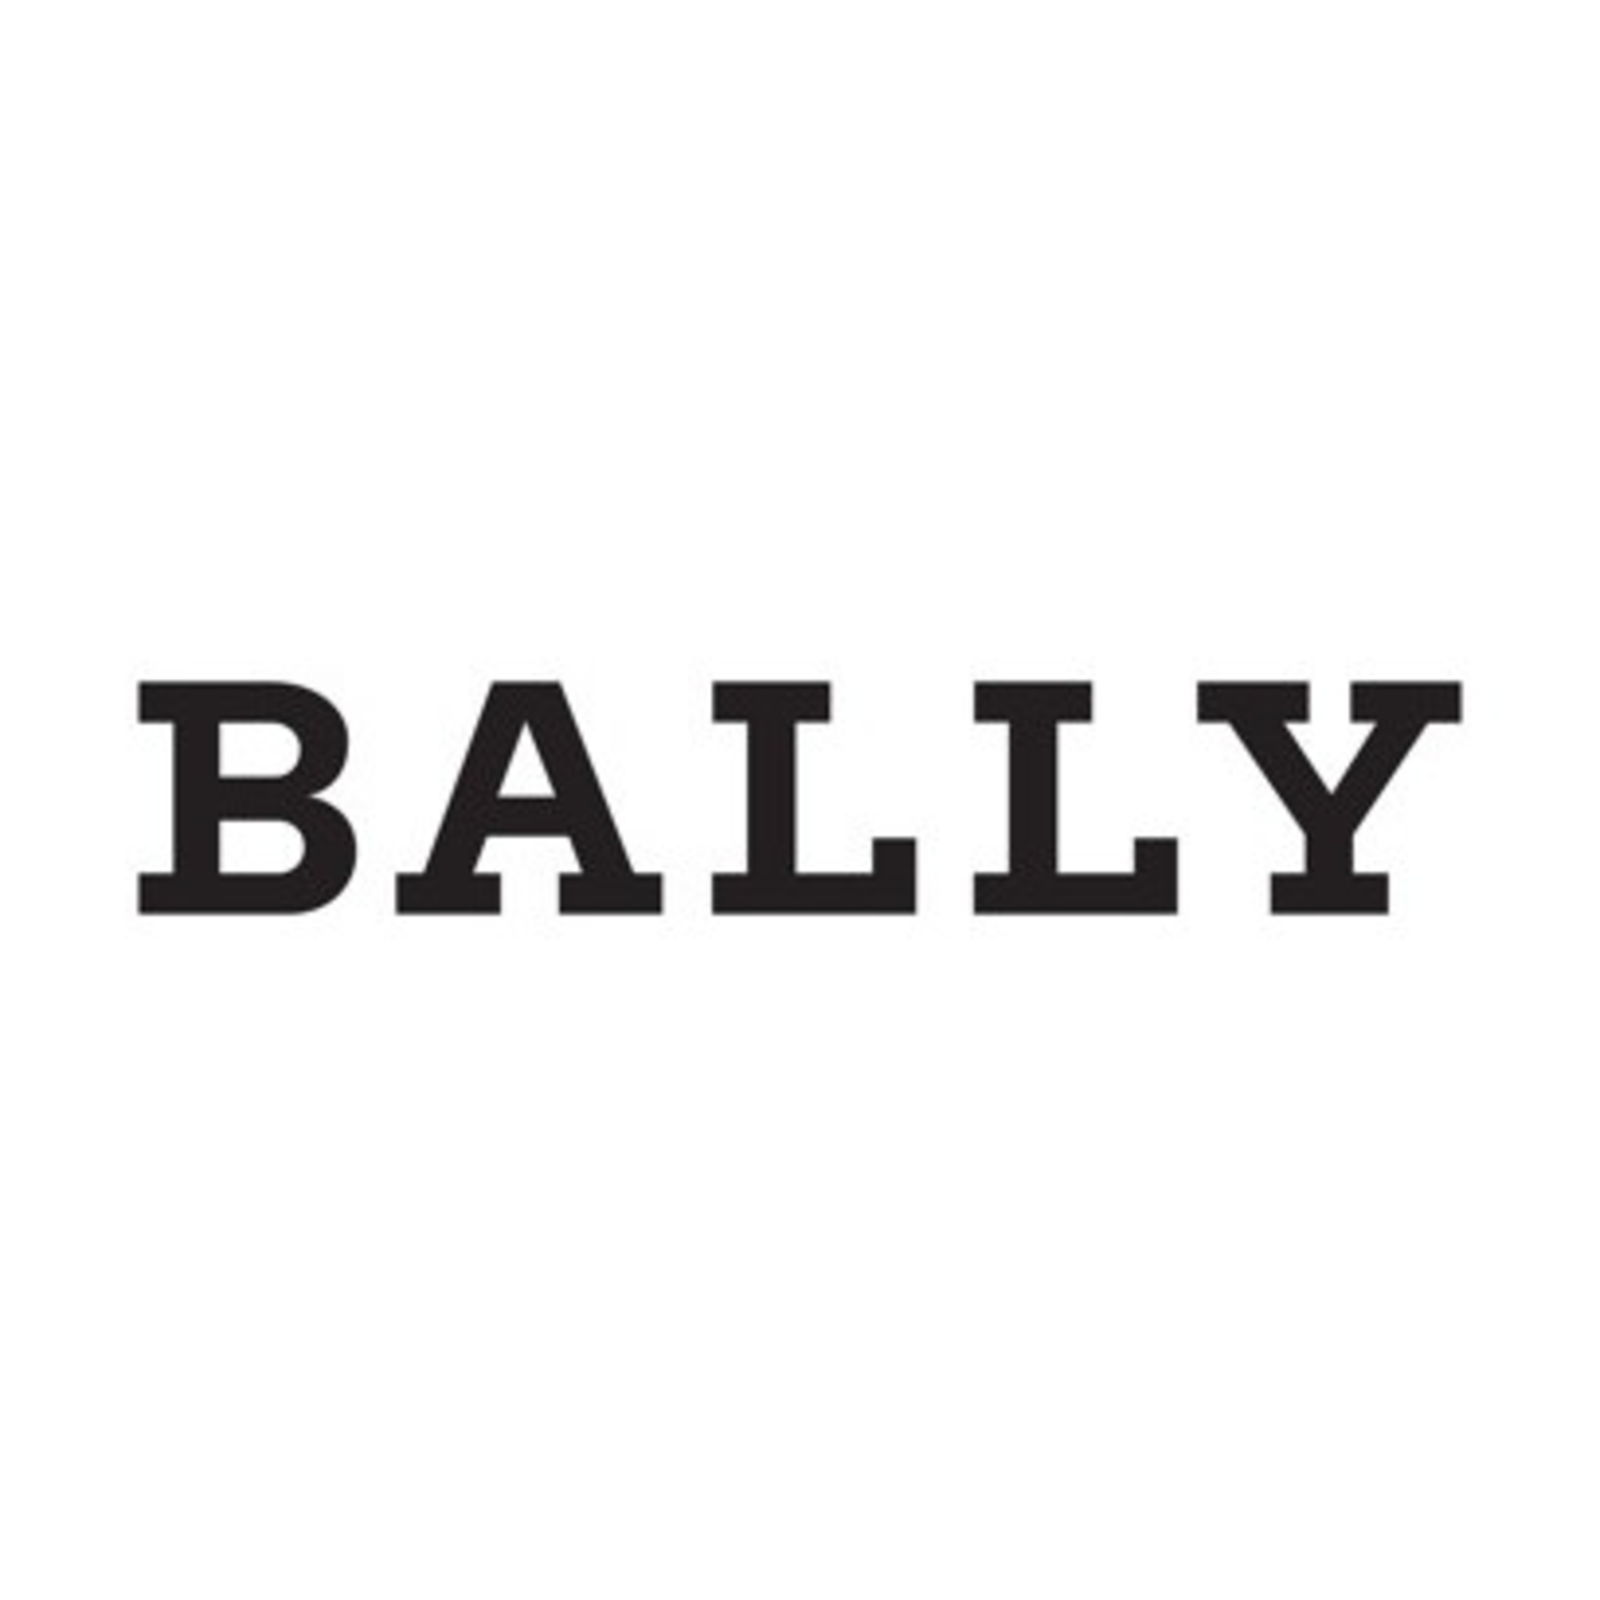 BALLY (Image 1)